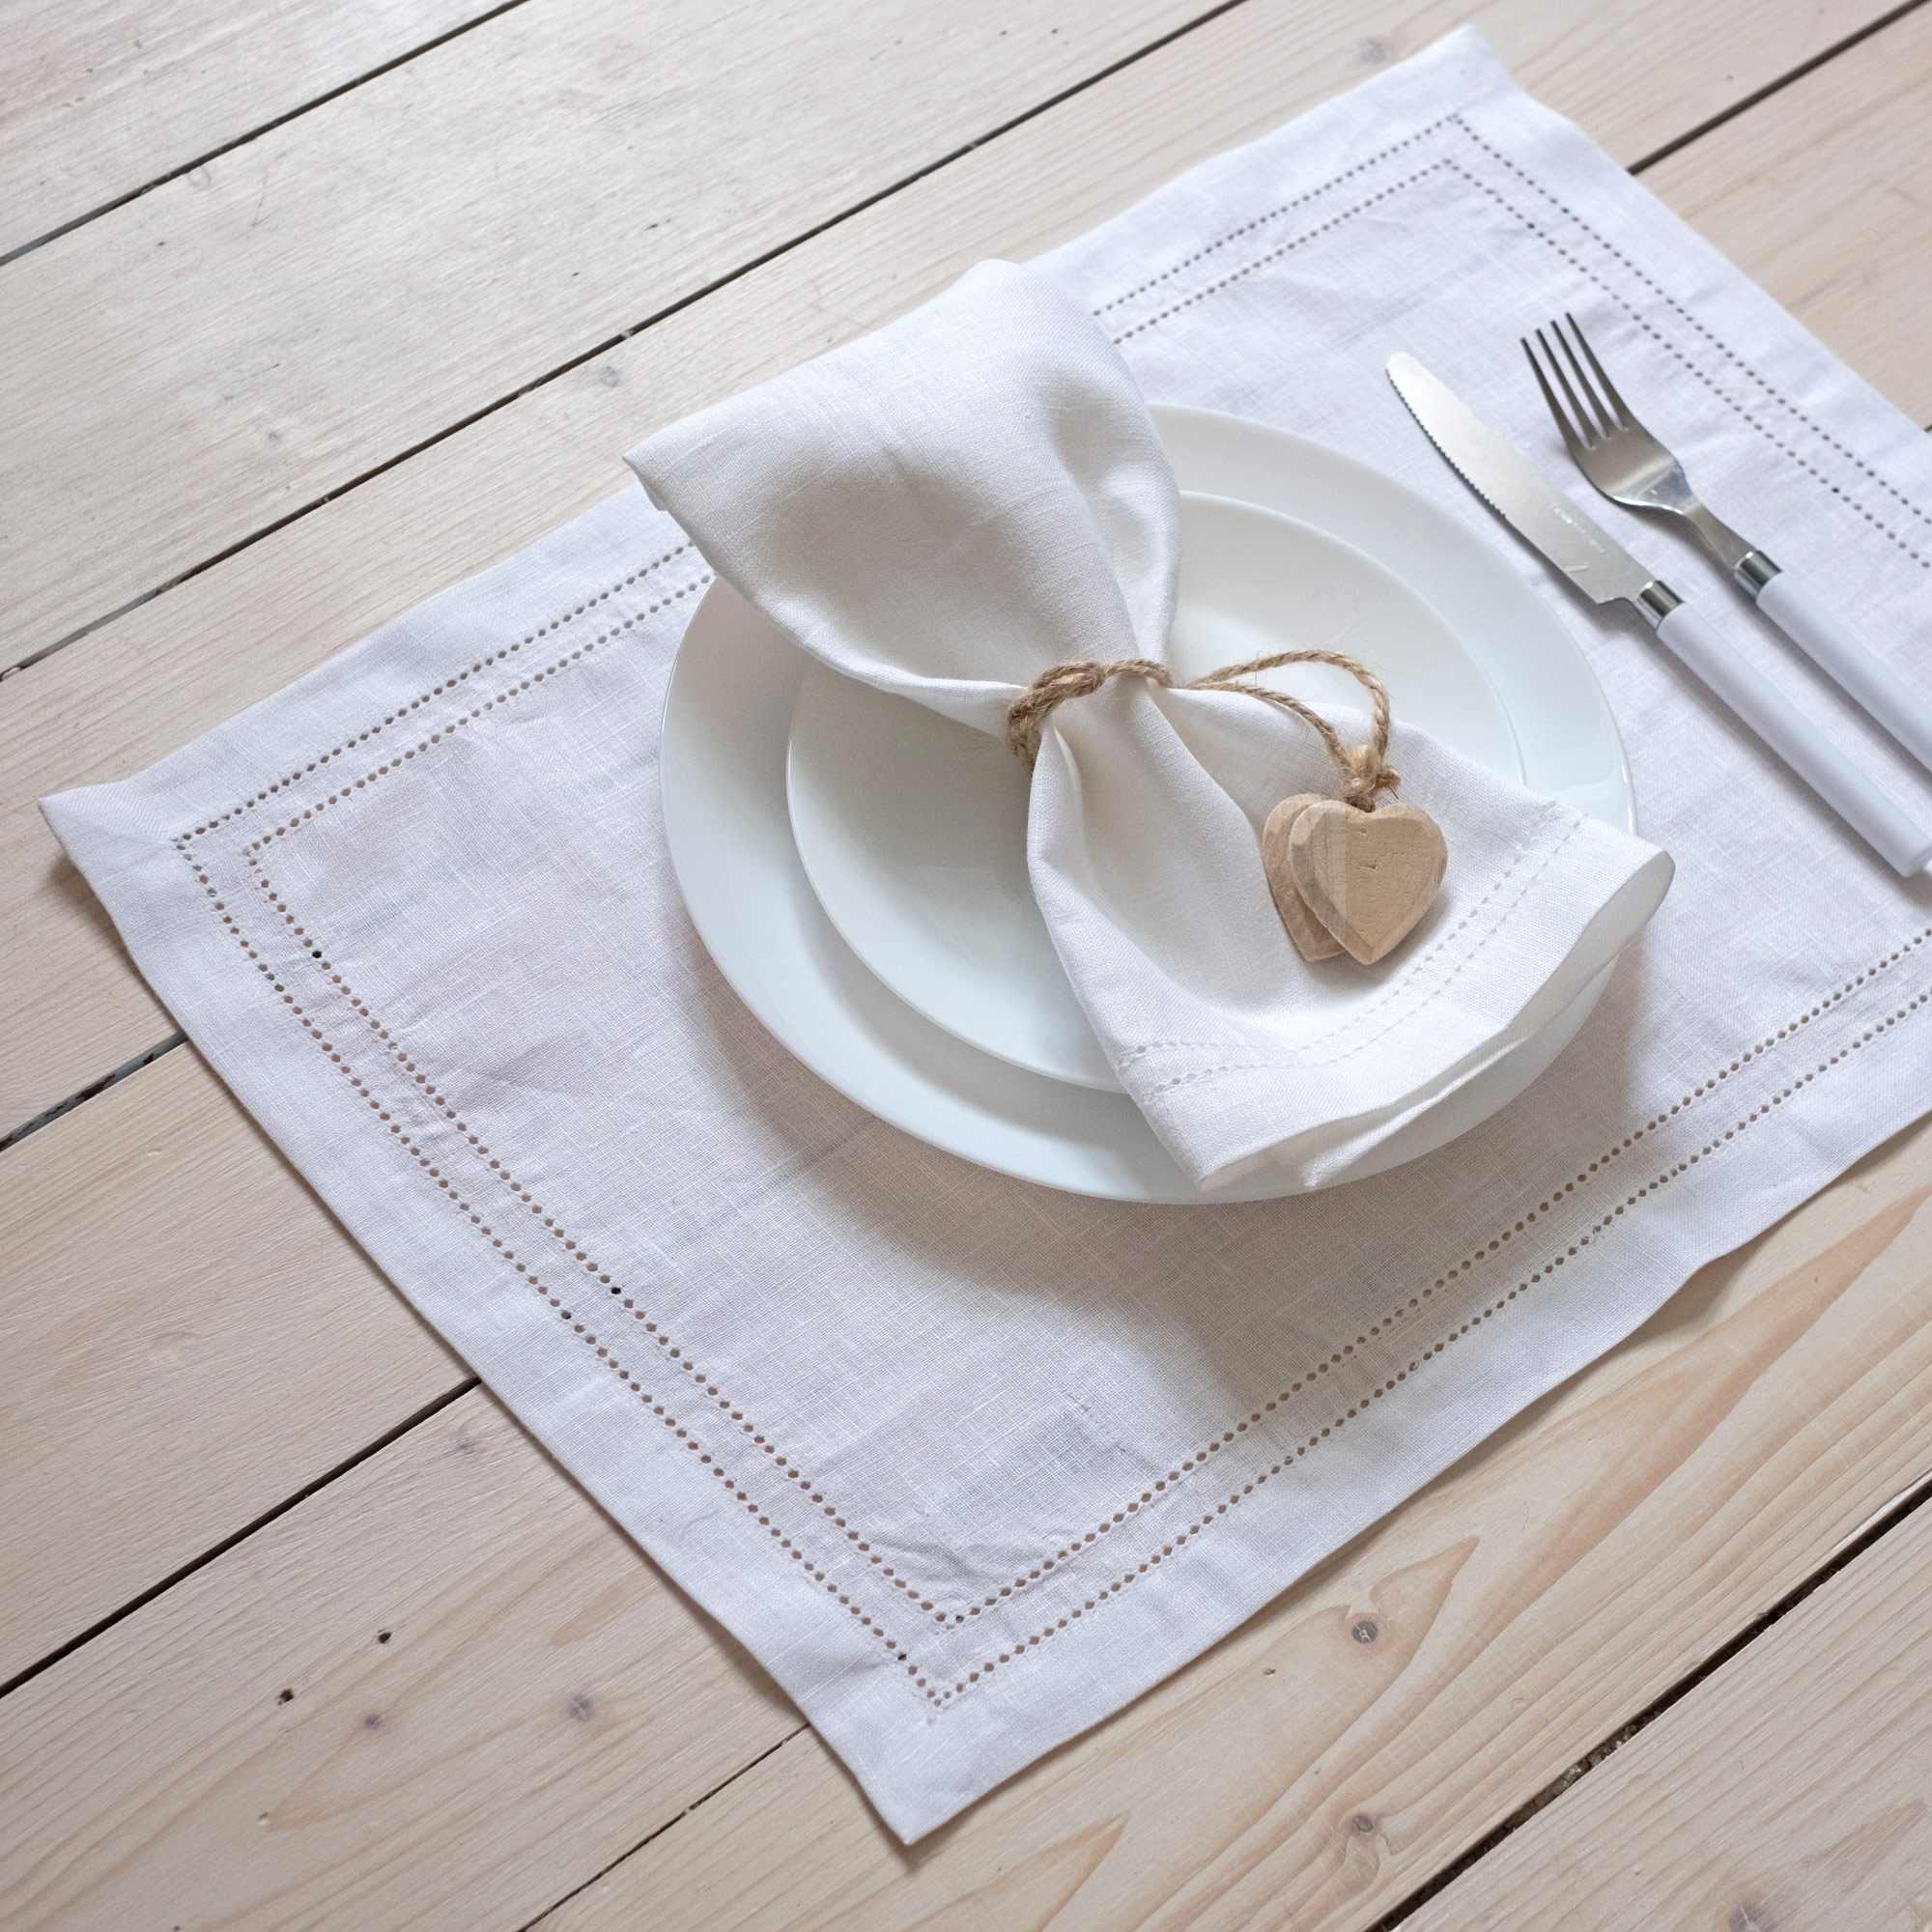 leinen tischsets hohlsaum elbla wei. Black Bedroom Furniture Sets. Home Design Ideas